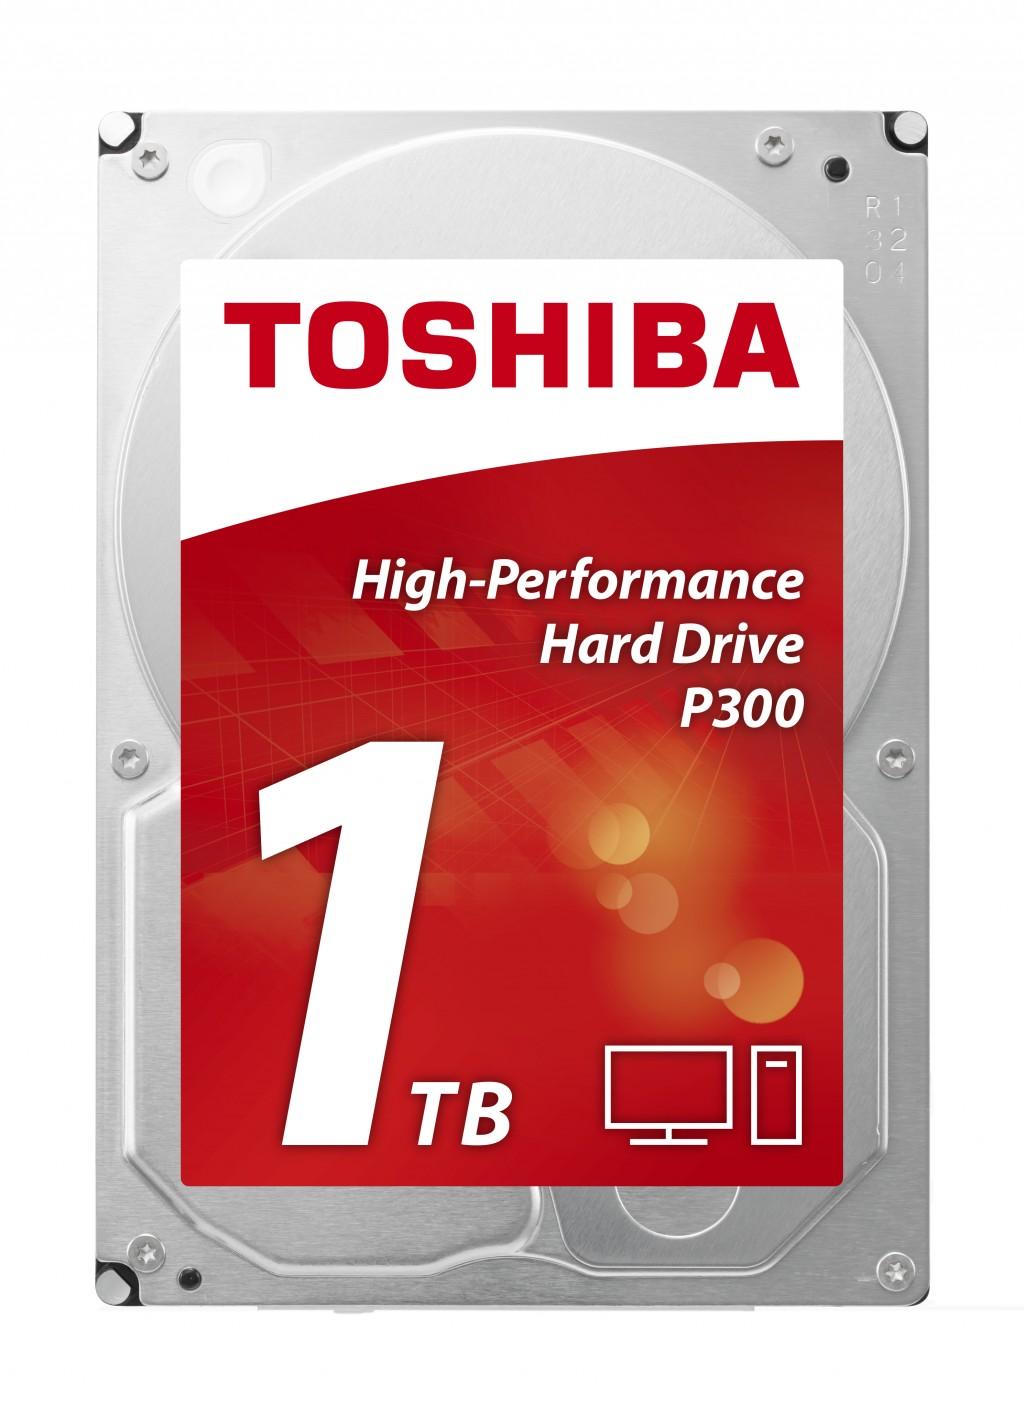 TOSHIBA P300 HP HDD 1TB Bulk